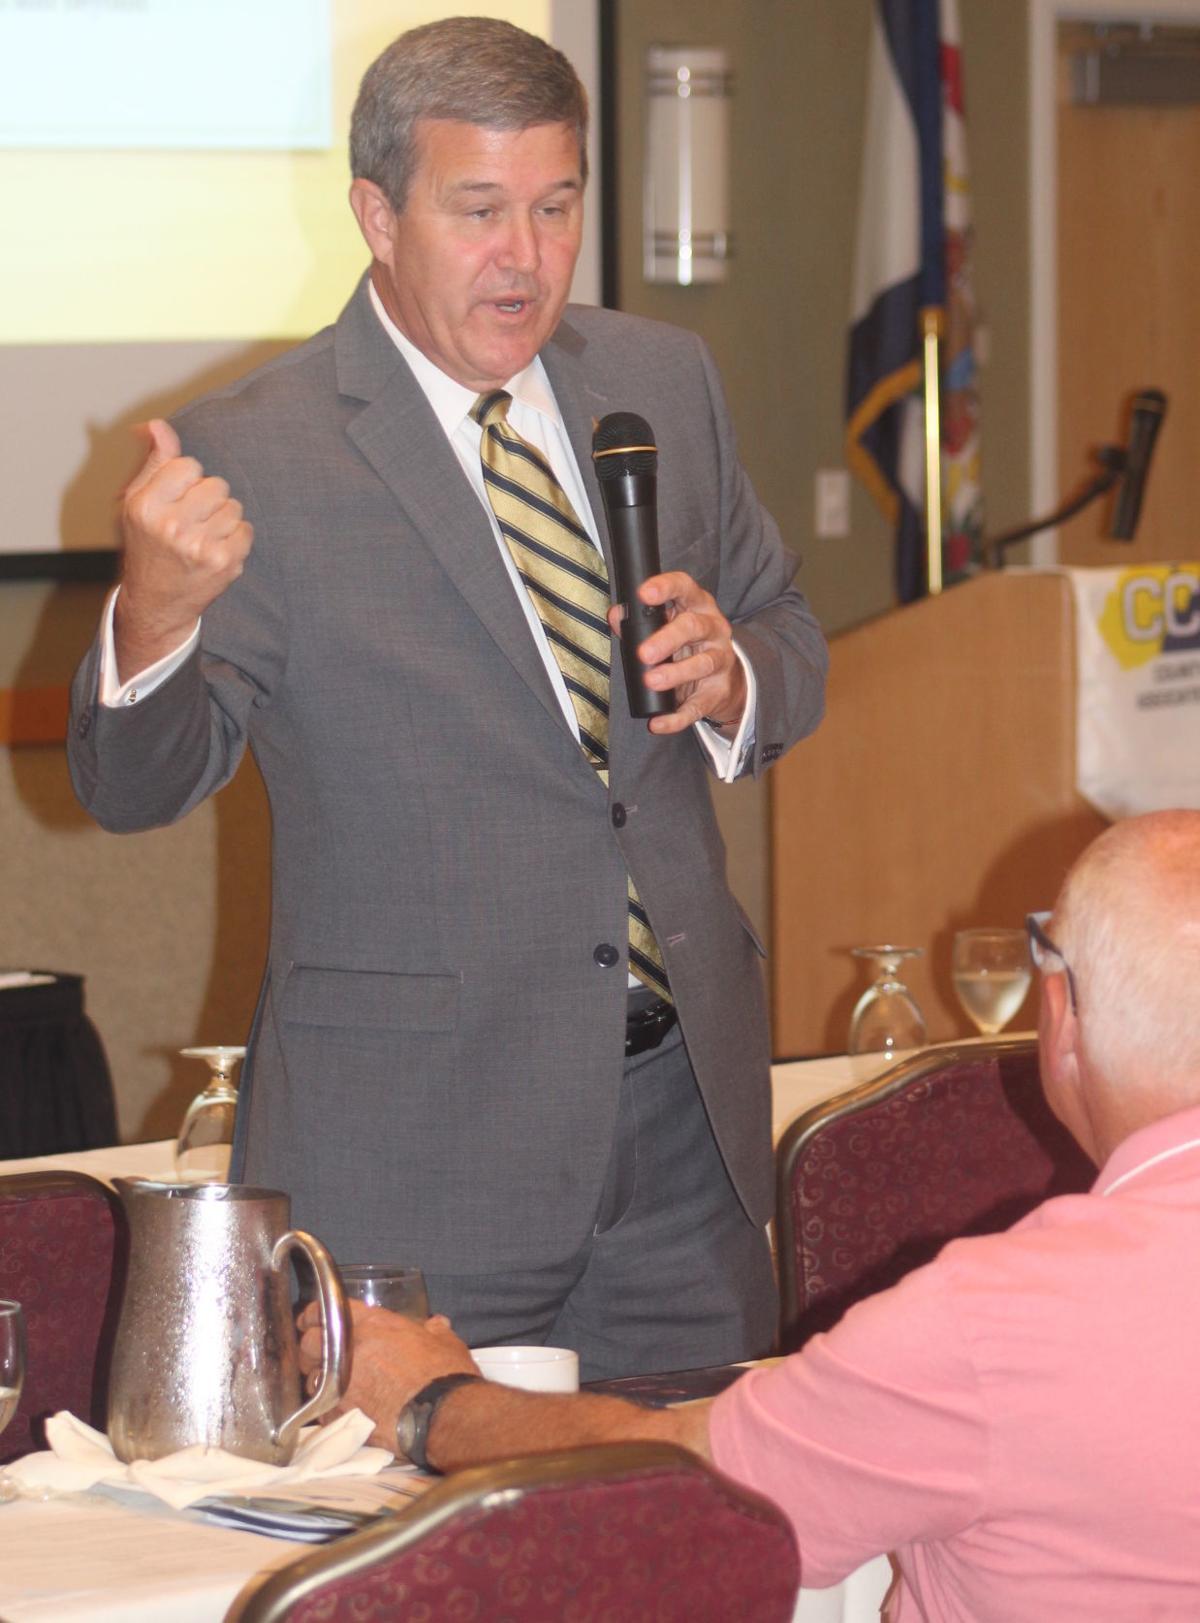 Warner on election security